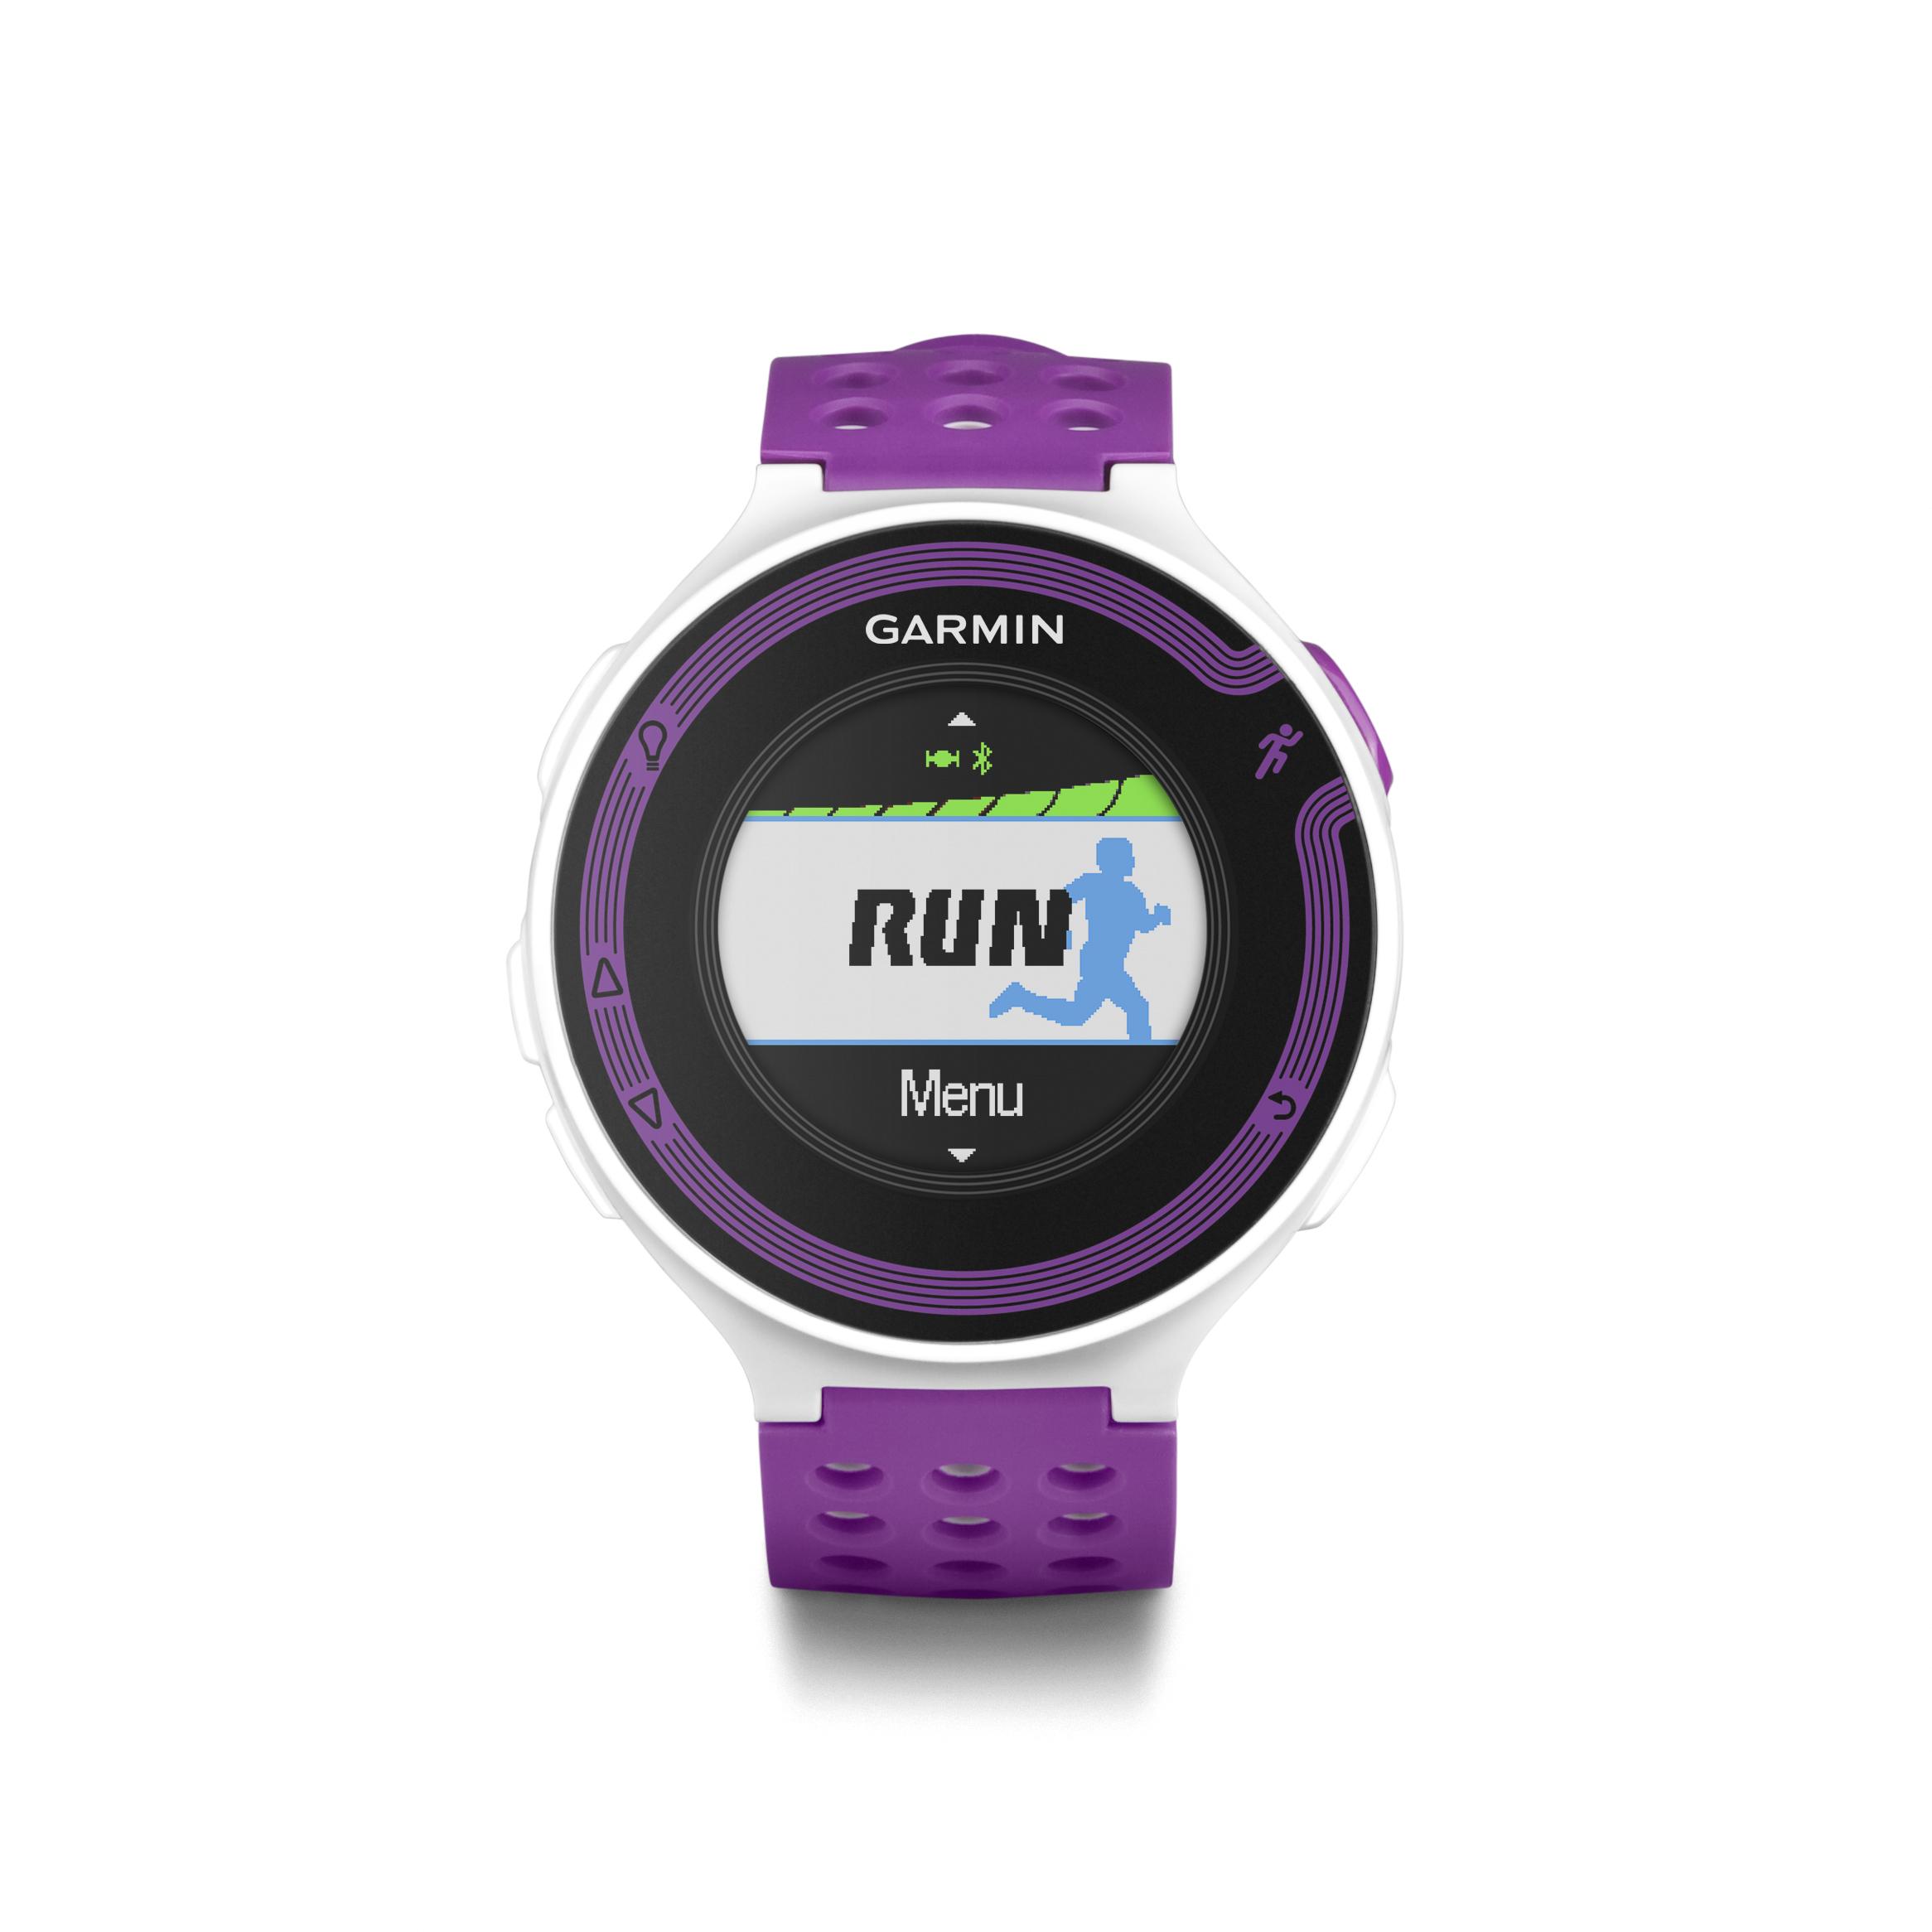 /Garmin Forerunner 220 Colour Display White/Violet GPS ...